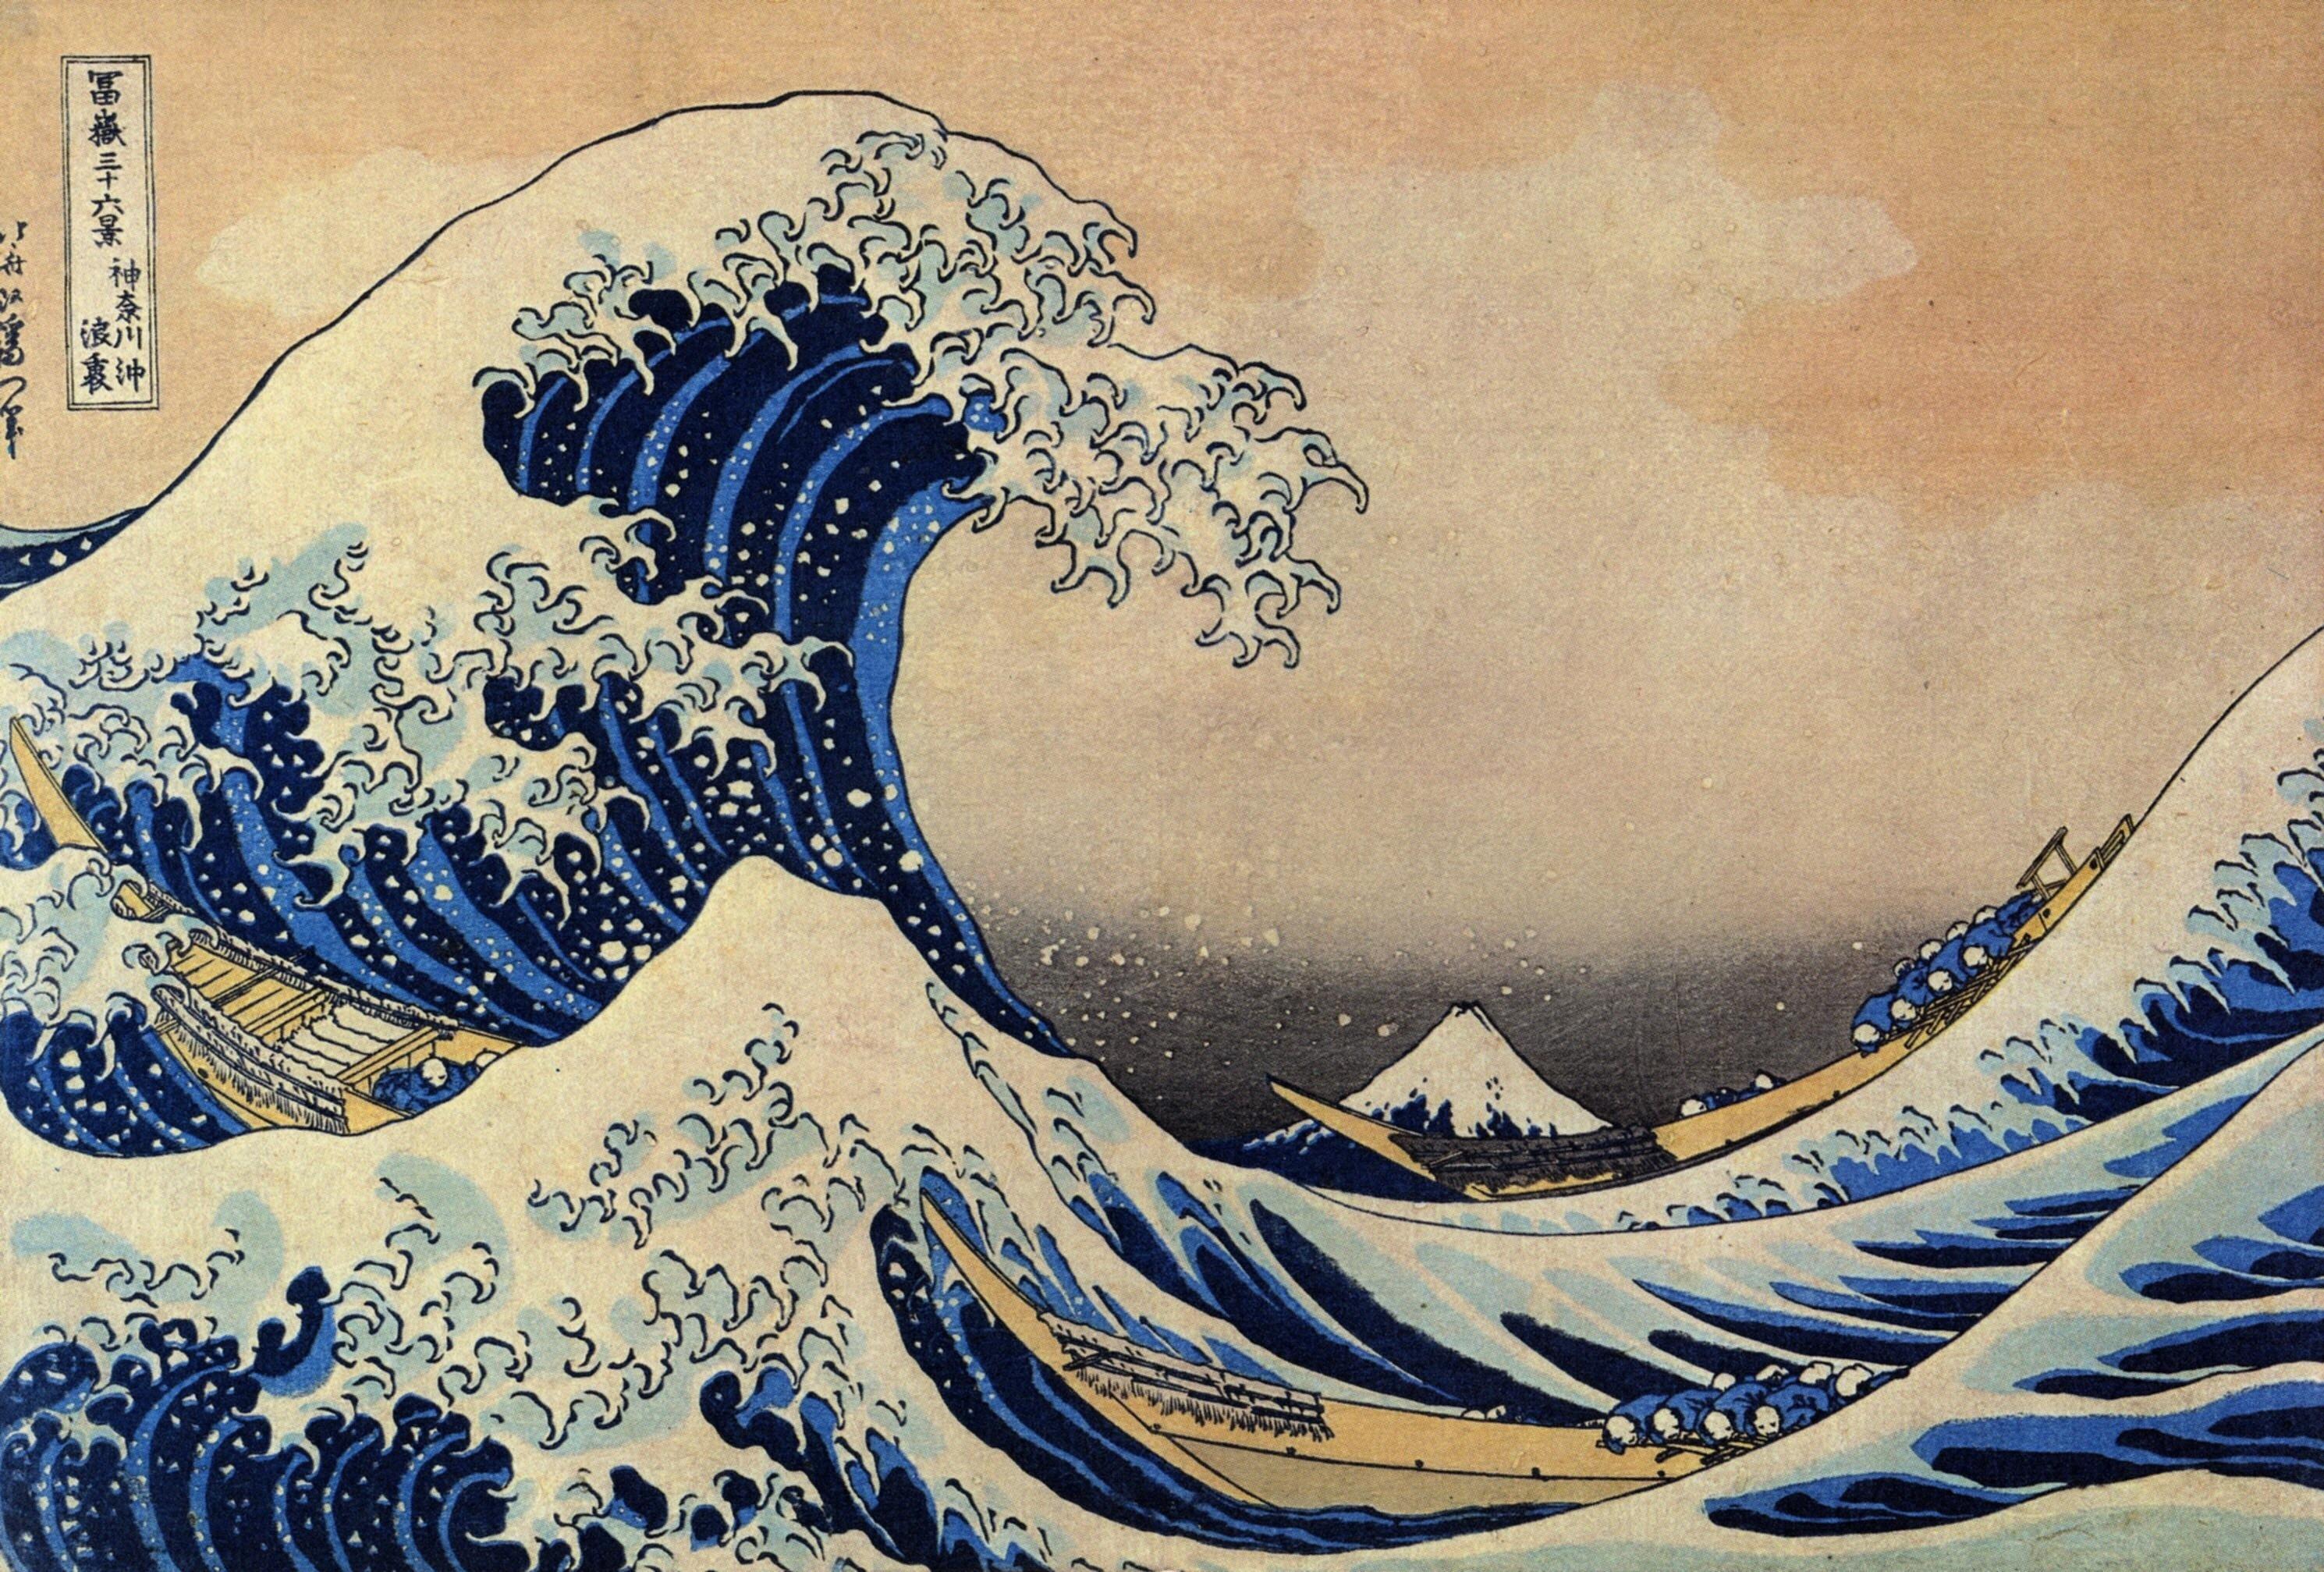 Katsushika Hokusai Wallpaper People HD WallpaperHi Res People 2979x2015